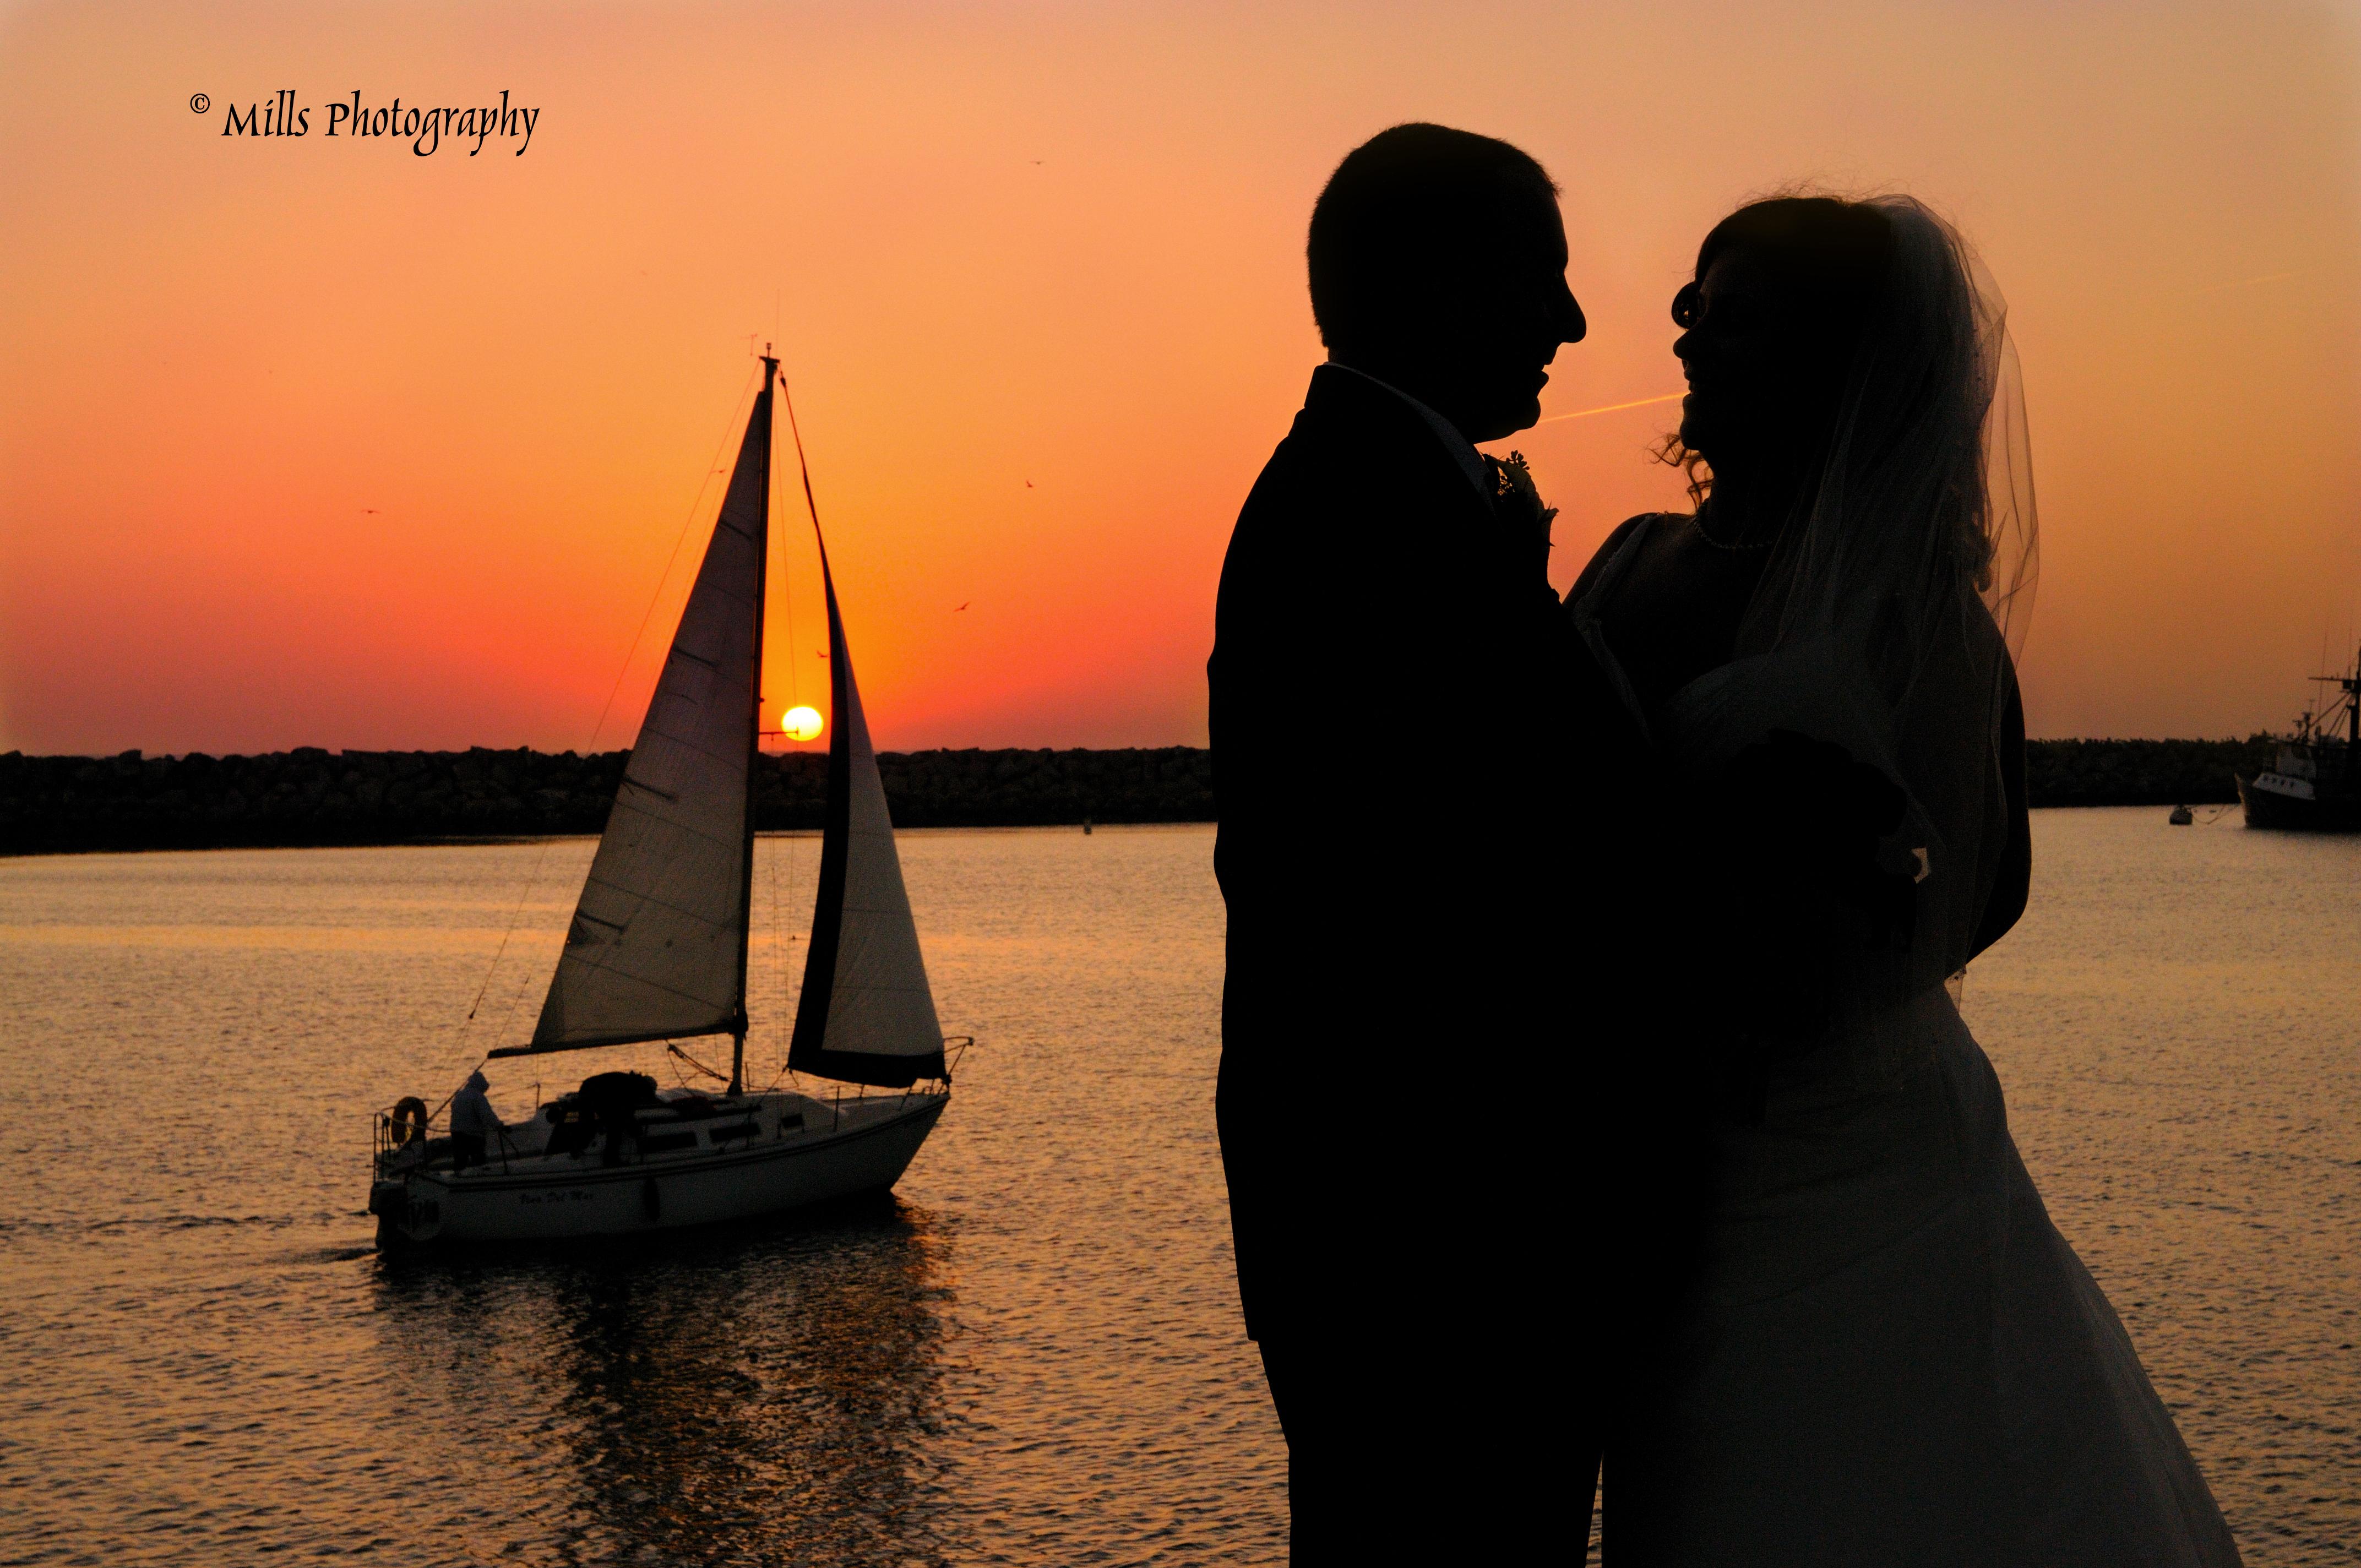 orange, red, Bride, Groom, Wedding, Ocean, Sunset, Beautiful, Silhouette, Sailboat